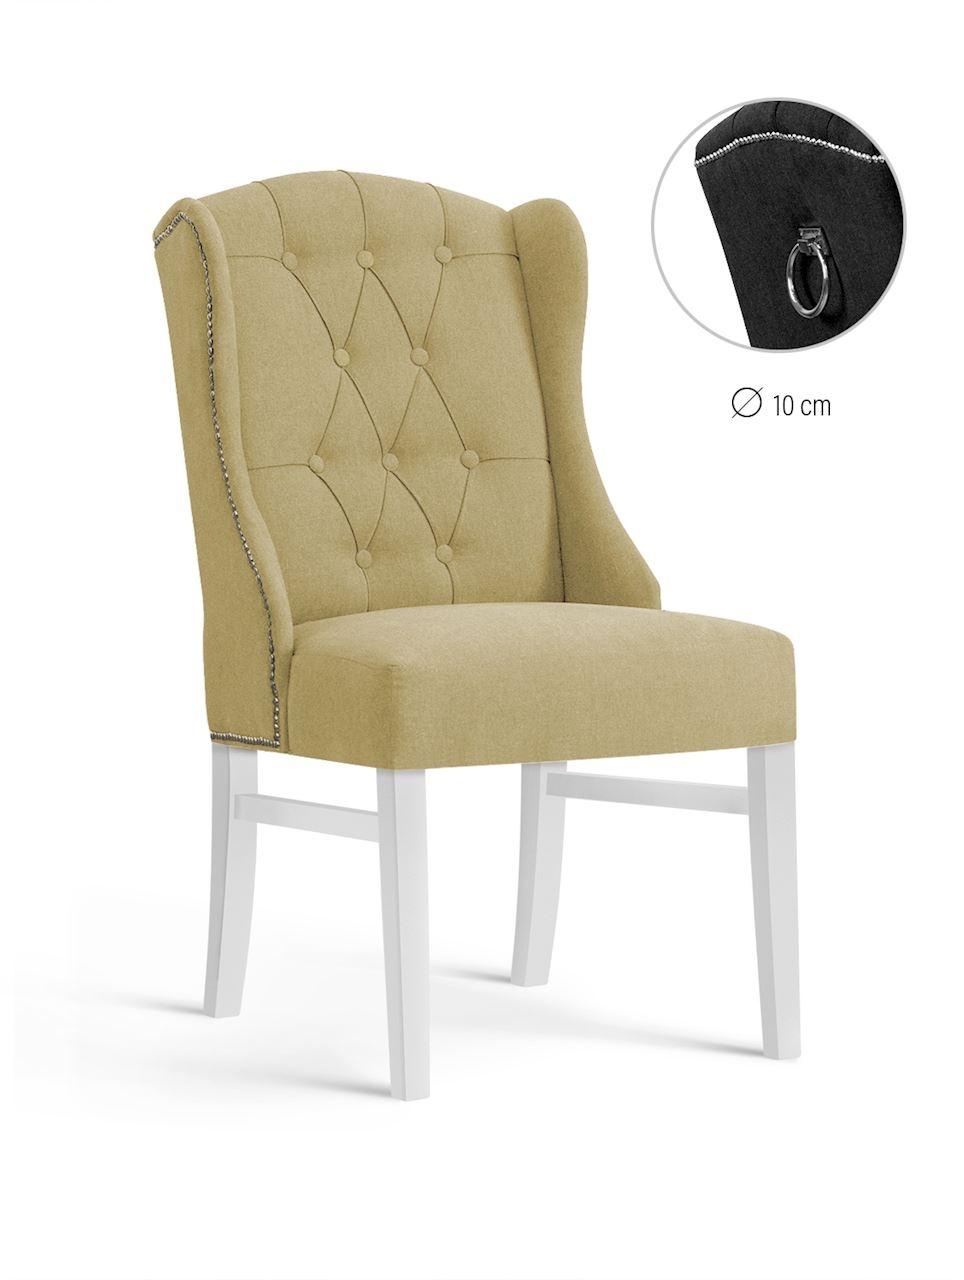 Scaun tapitat cu stofa, cu picioare din lemn Royal Beige / White, l55xA74xH105 cm